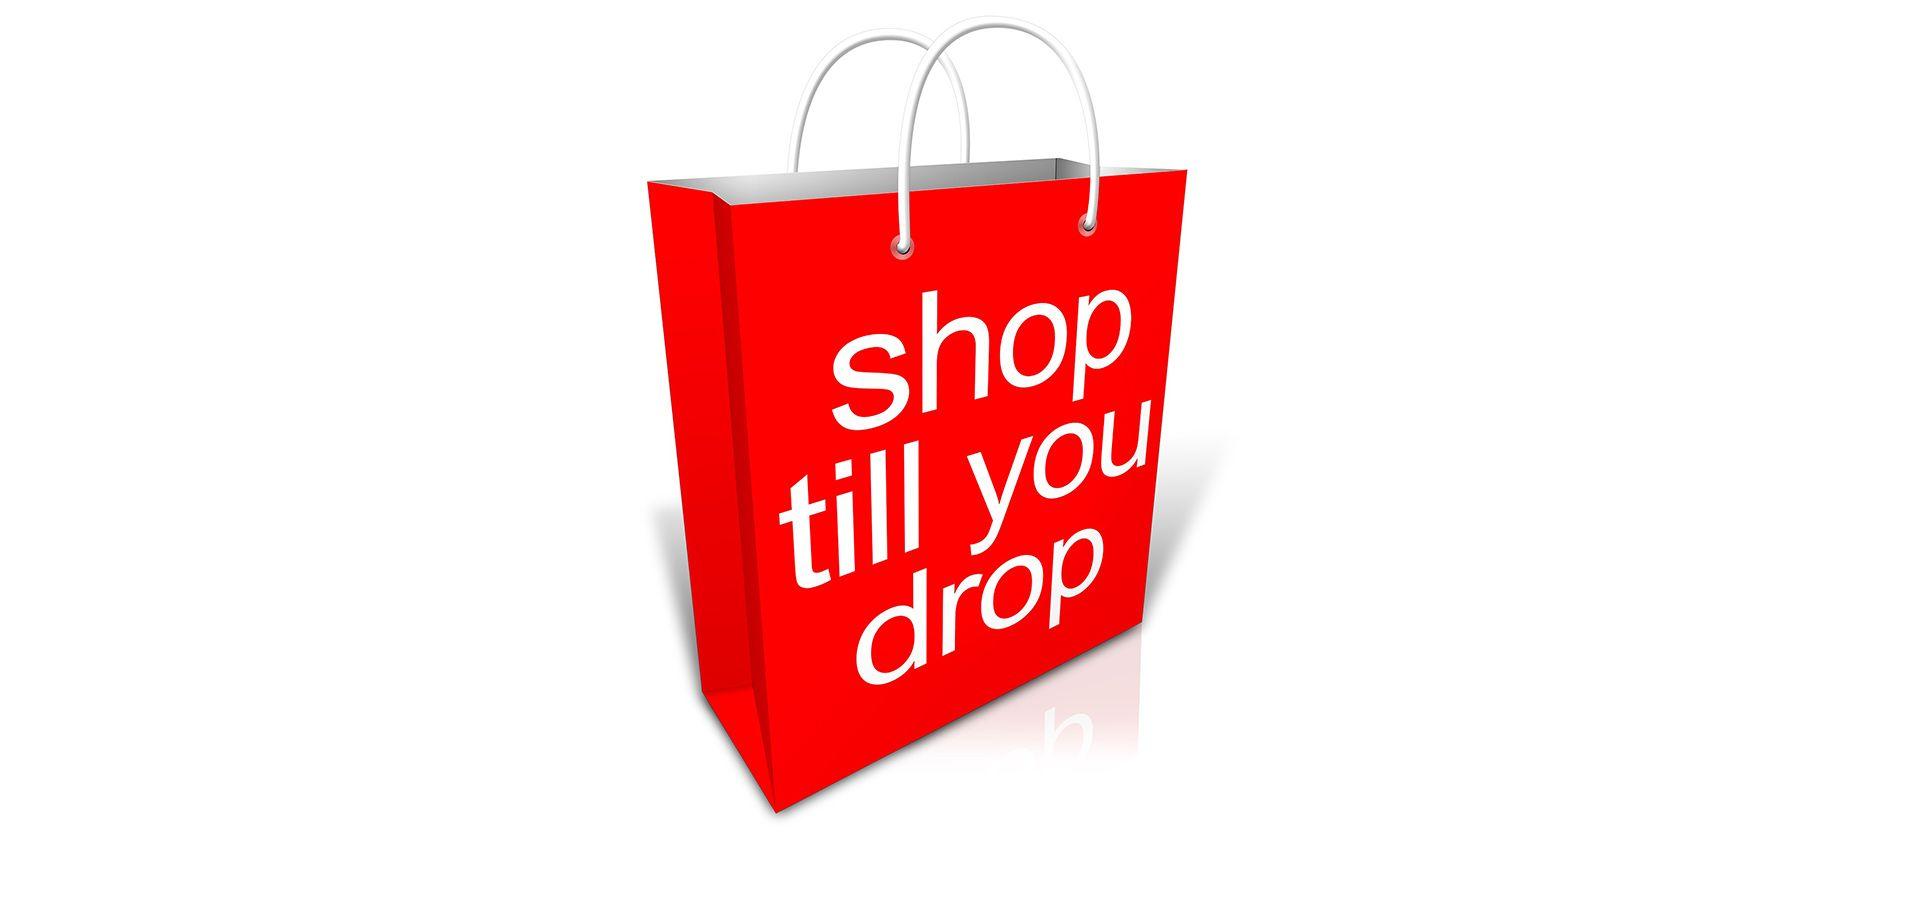 Impulse Sales through POP Signage and Displays